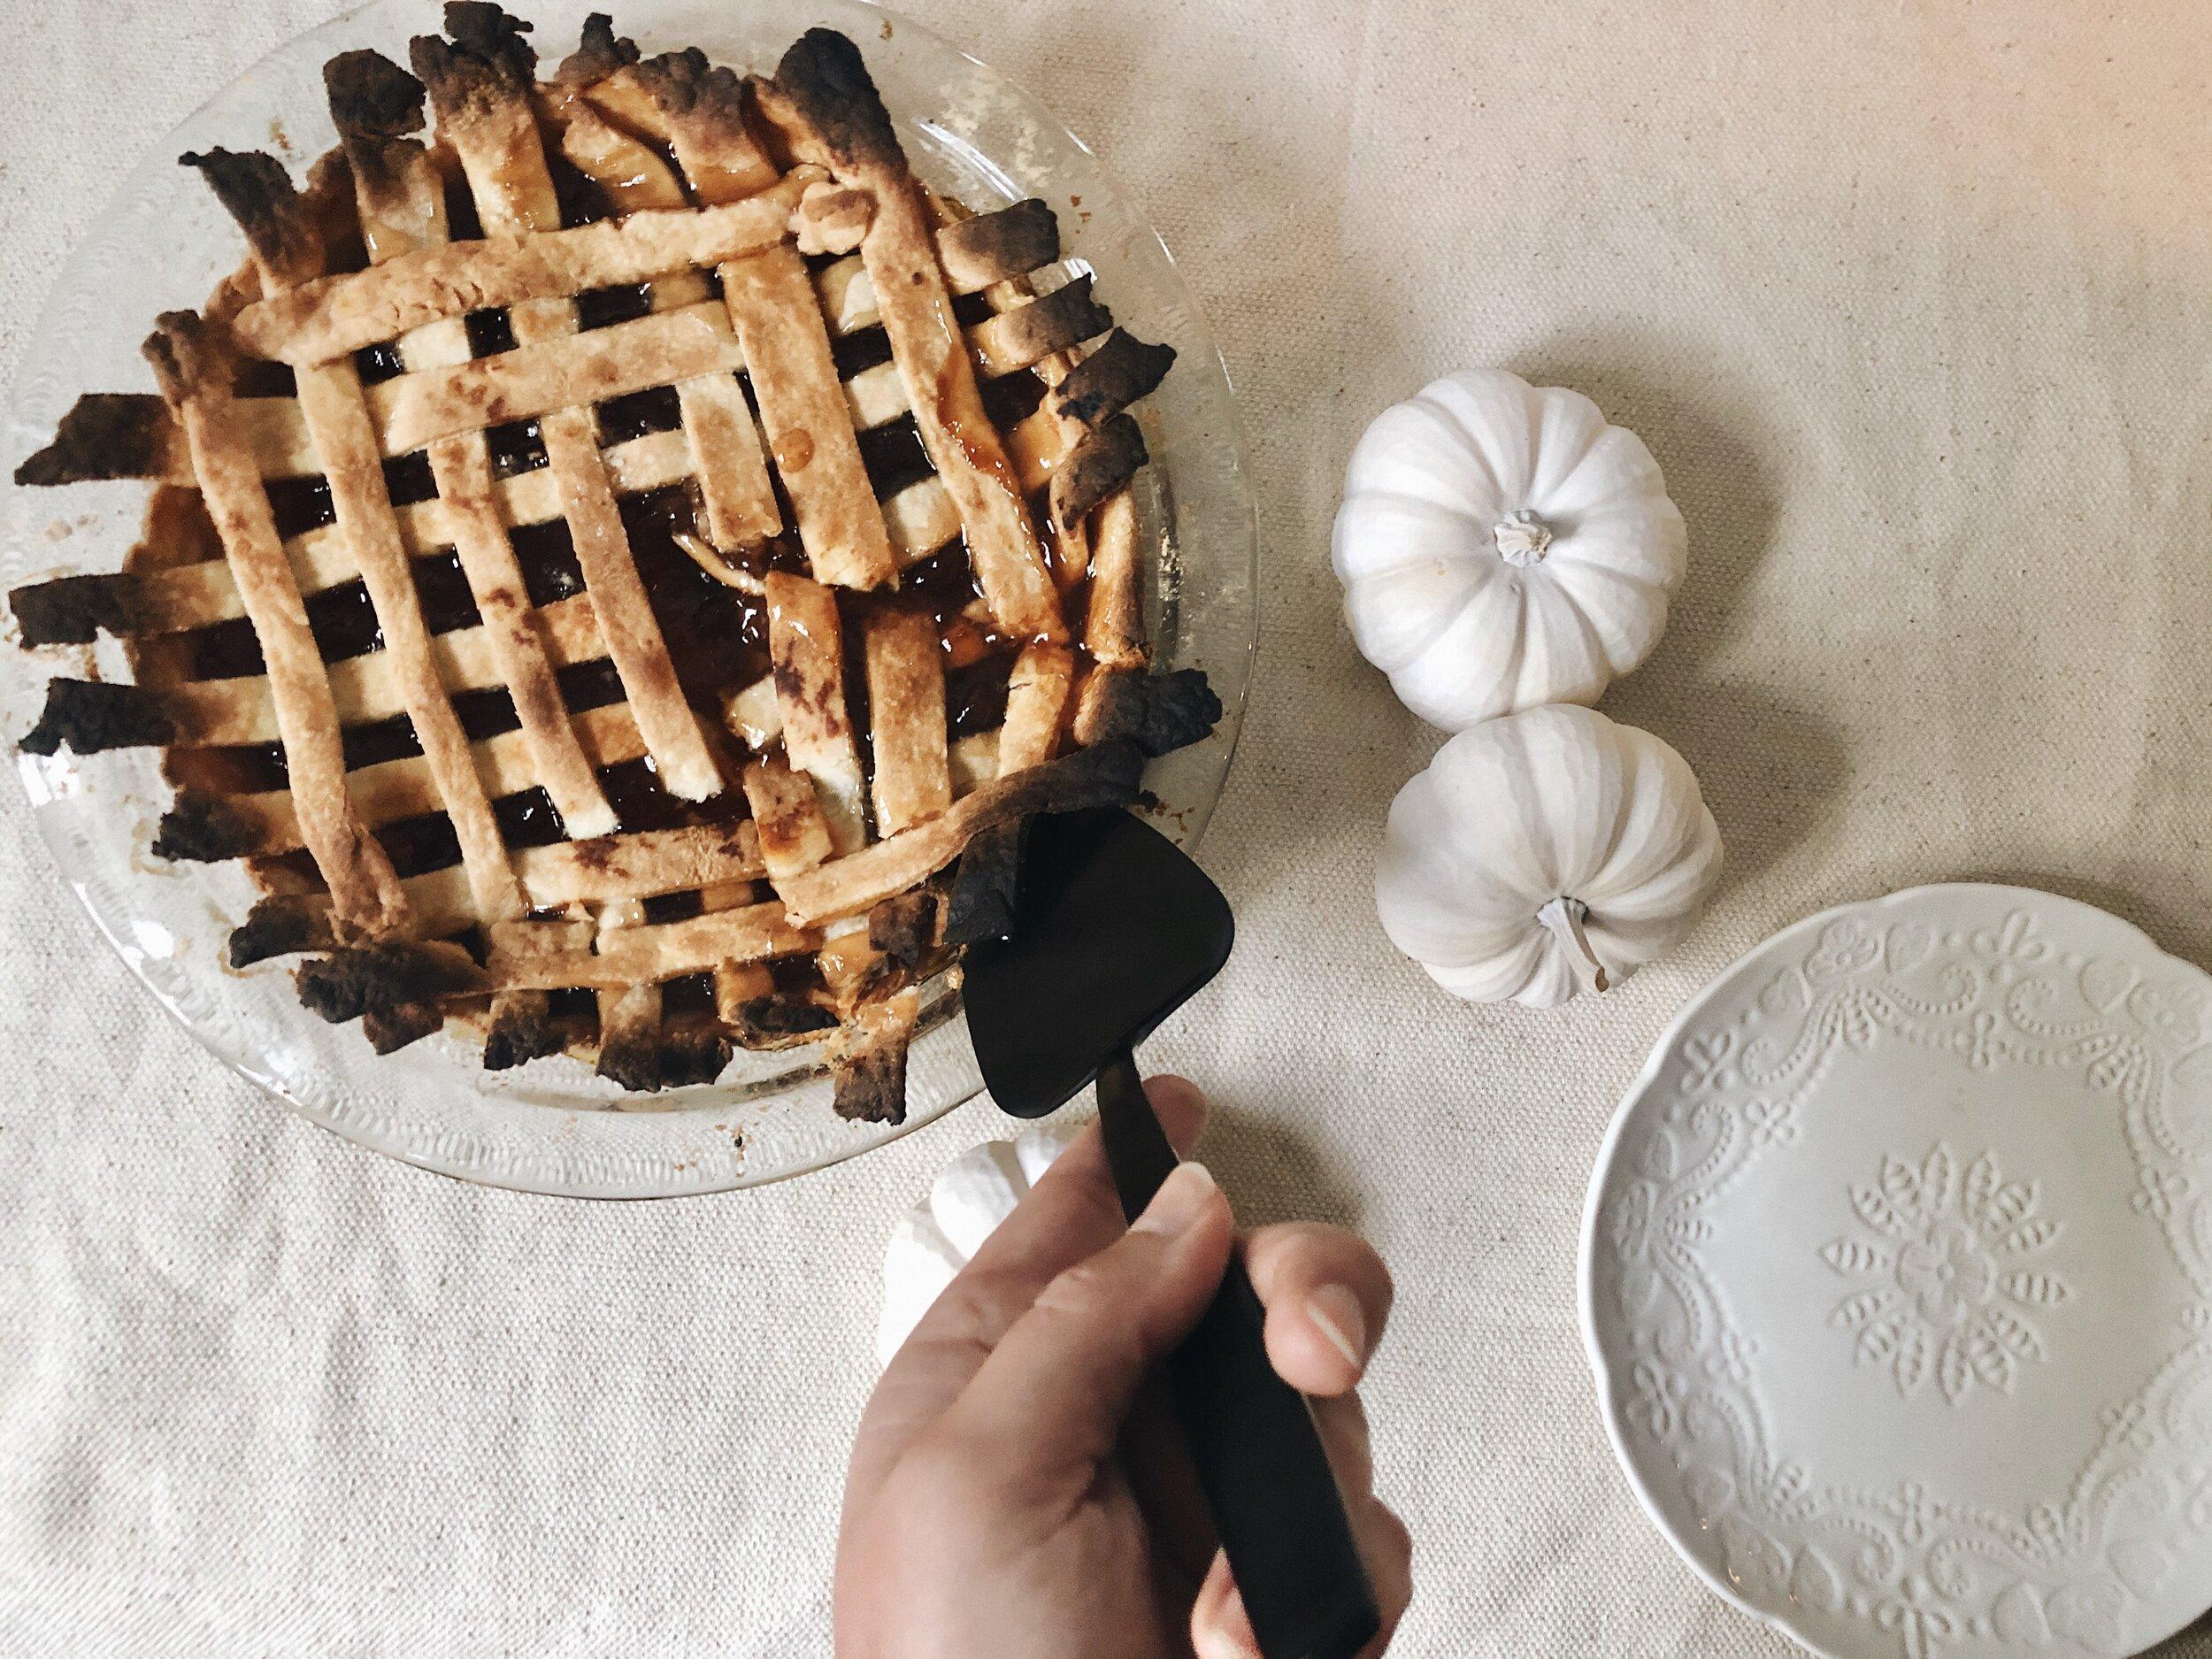 cutting a piece of pie